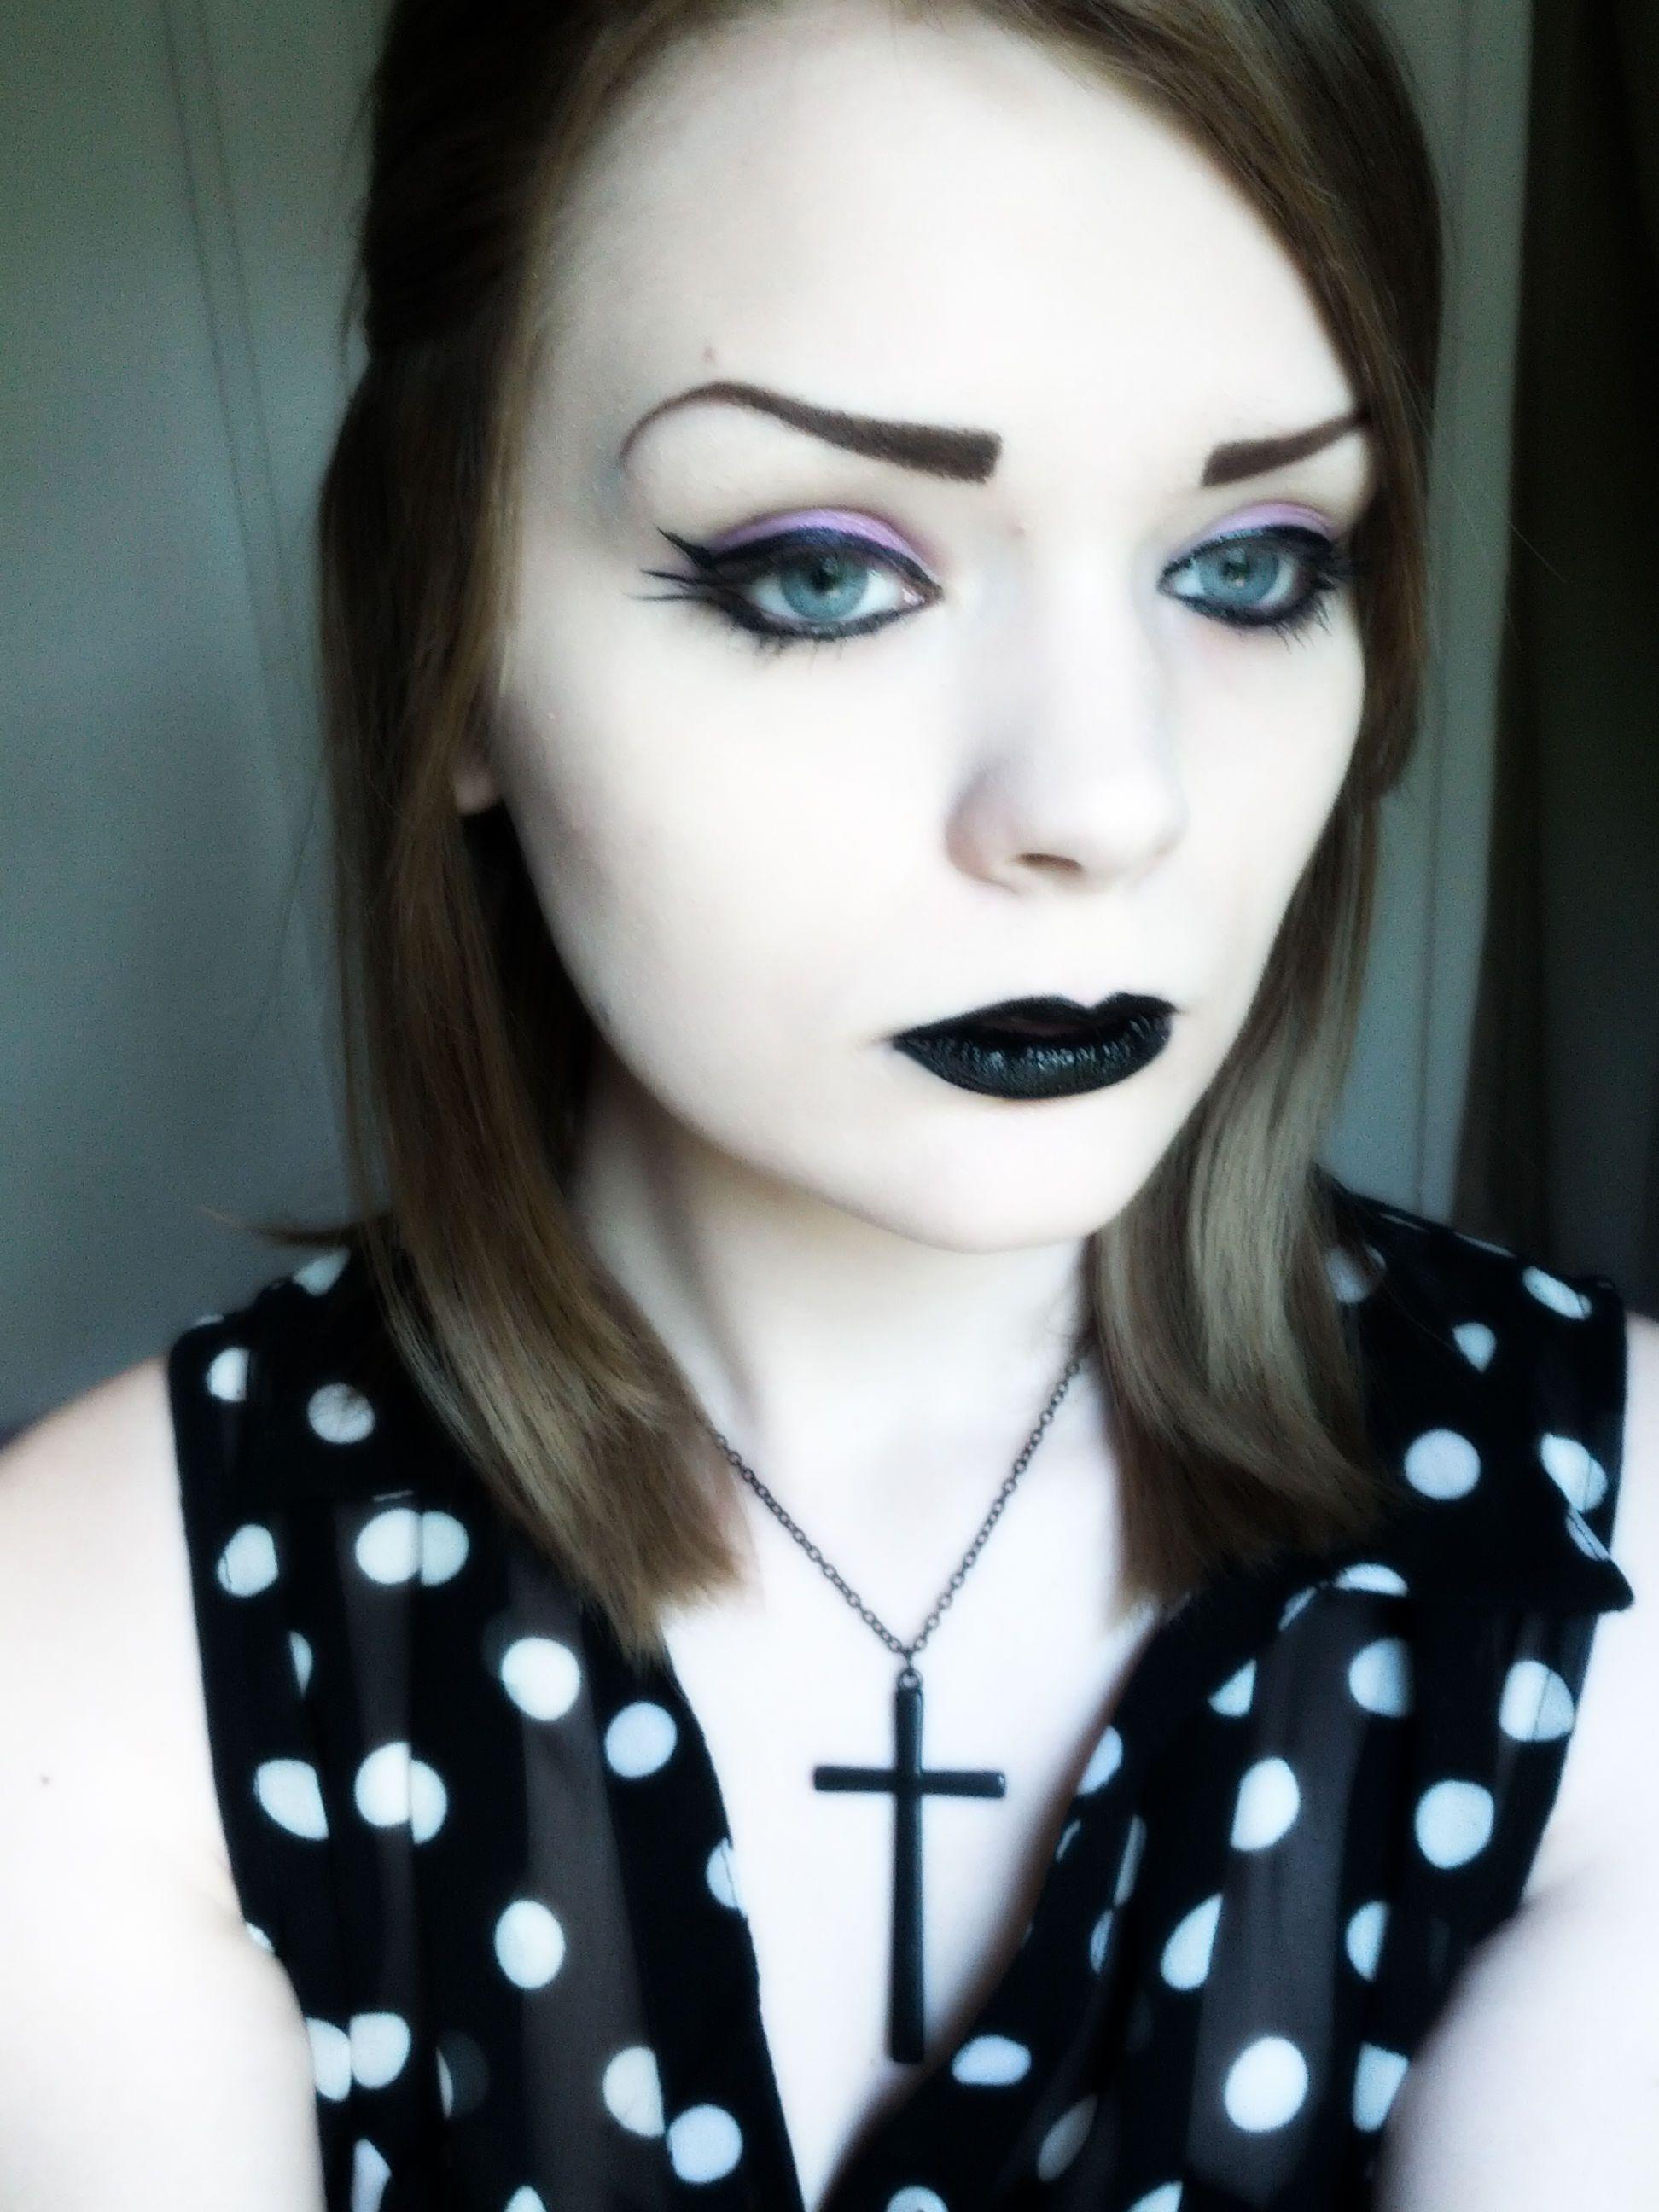 Pastel goth grunge goth gothic makeup Gothic beauty